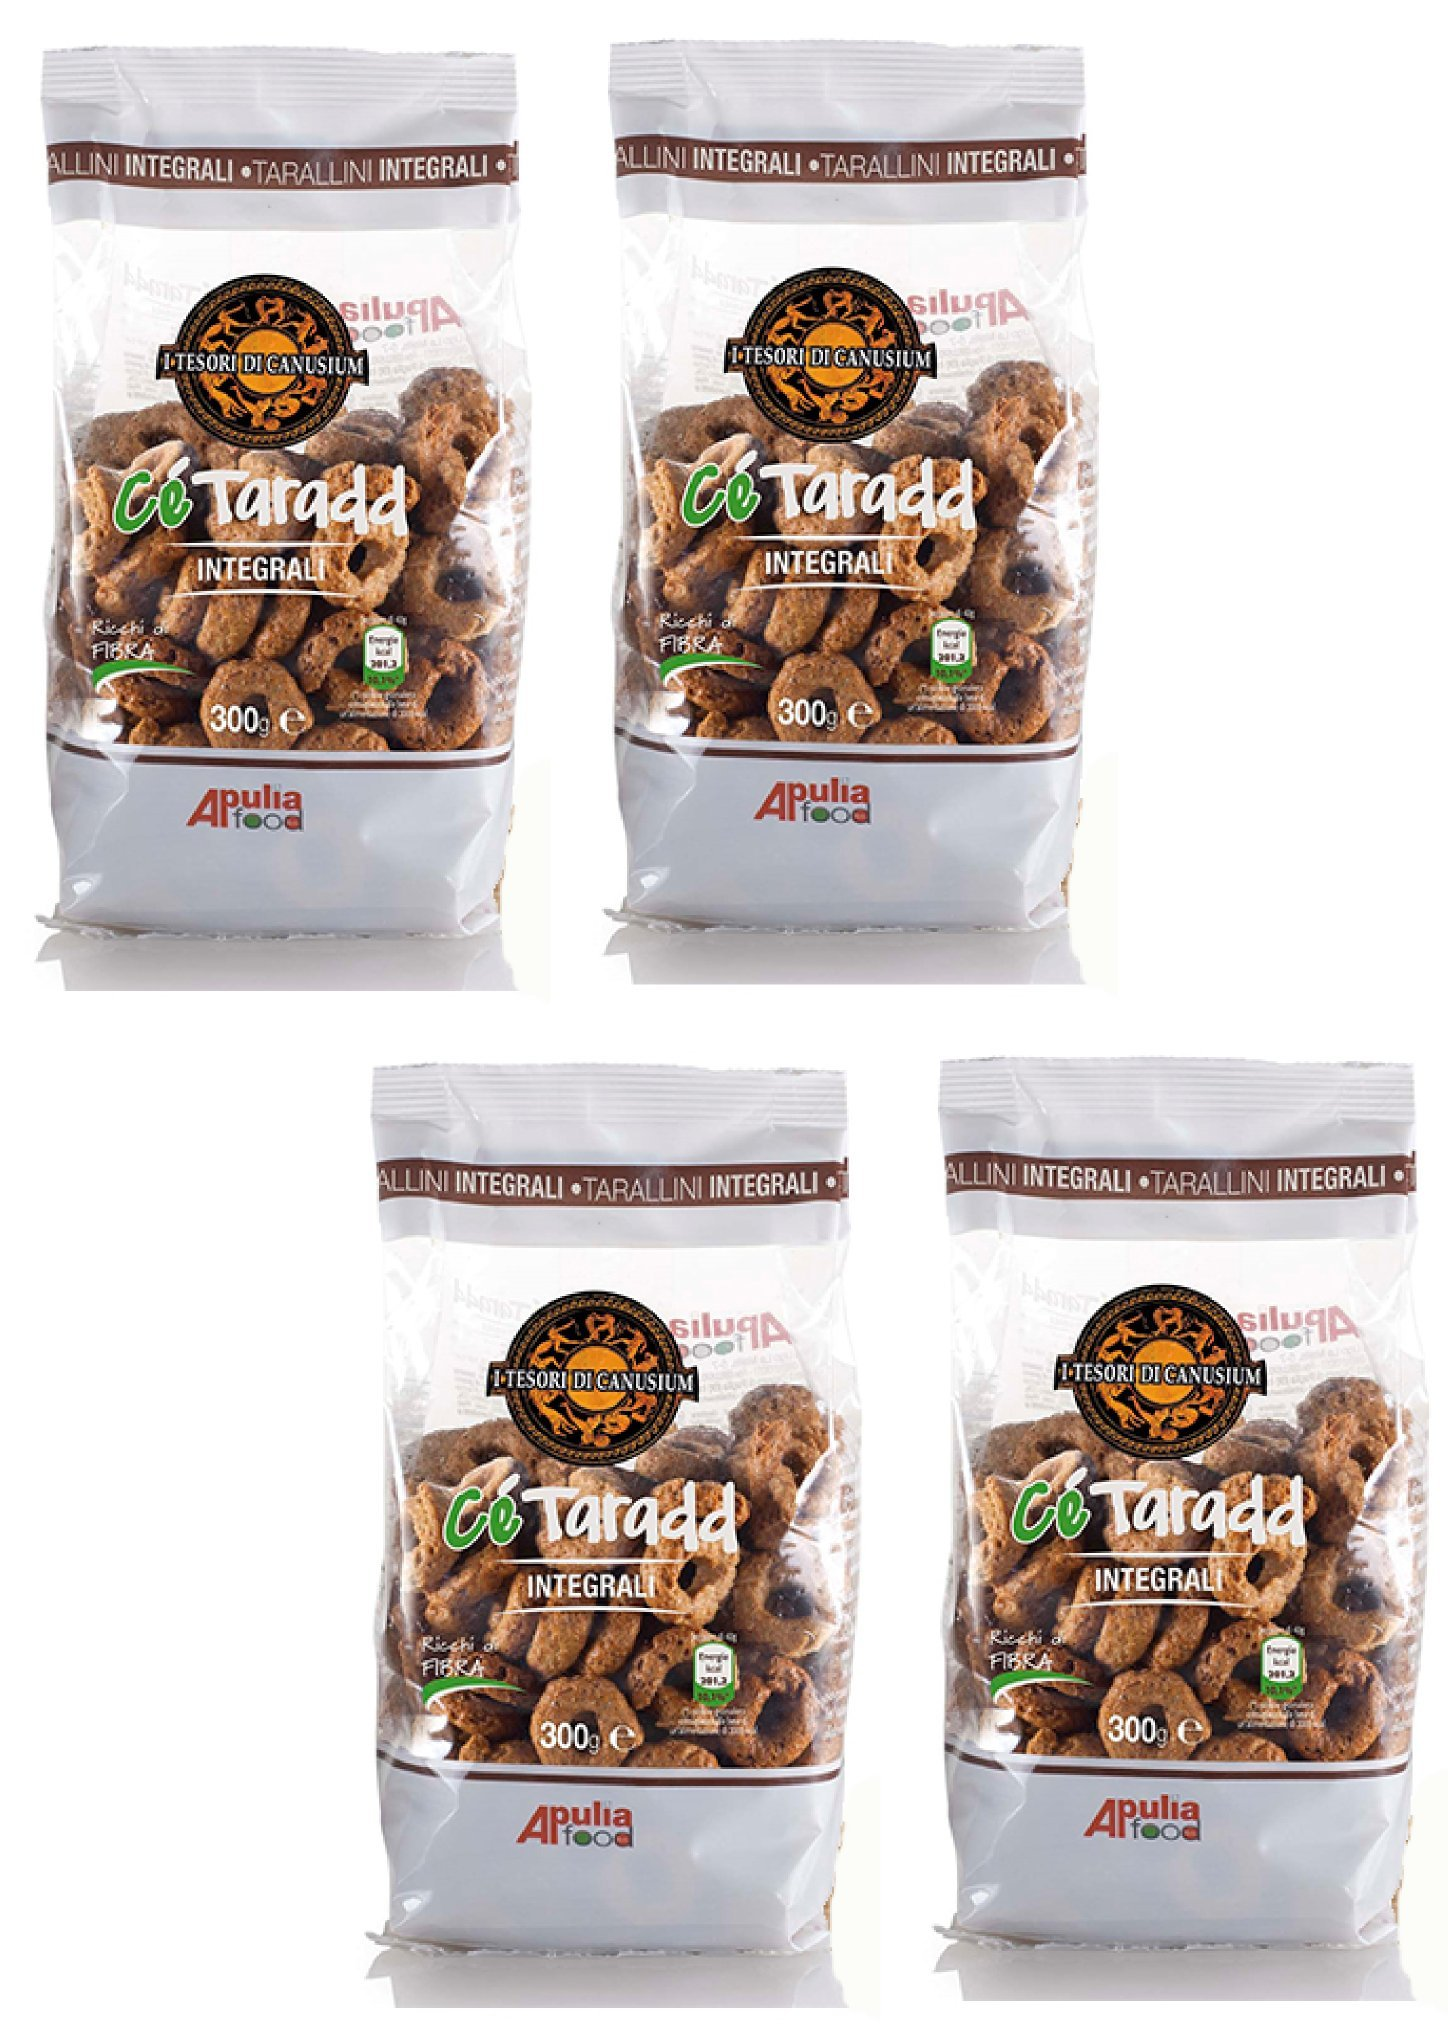 I Tesori di Canusium: Ce Taradd Integrali, Taralli with Whole Wheat 10.58 Ounce (300gr) Package (Pack of 4) [ Italian Import ]